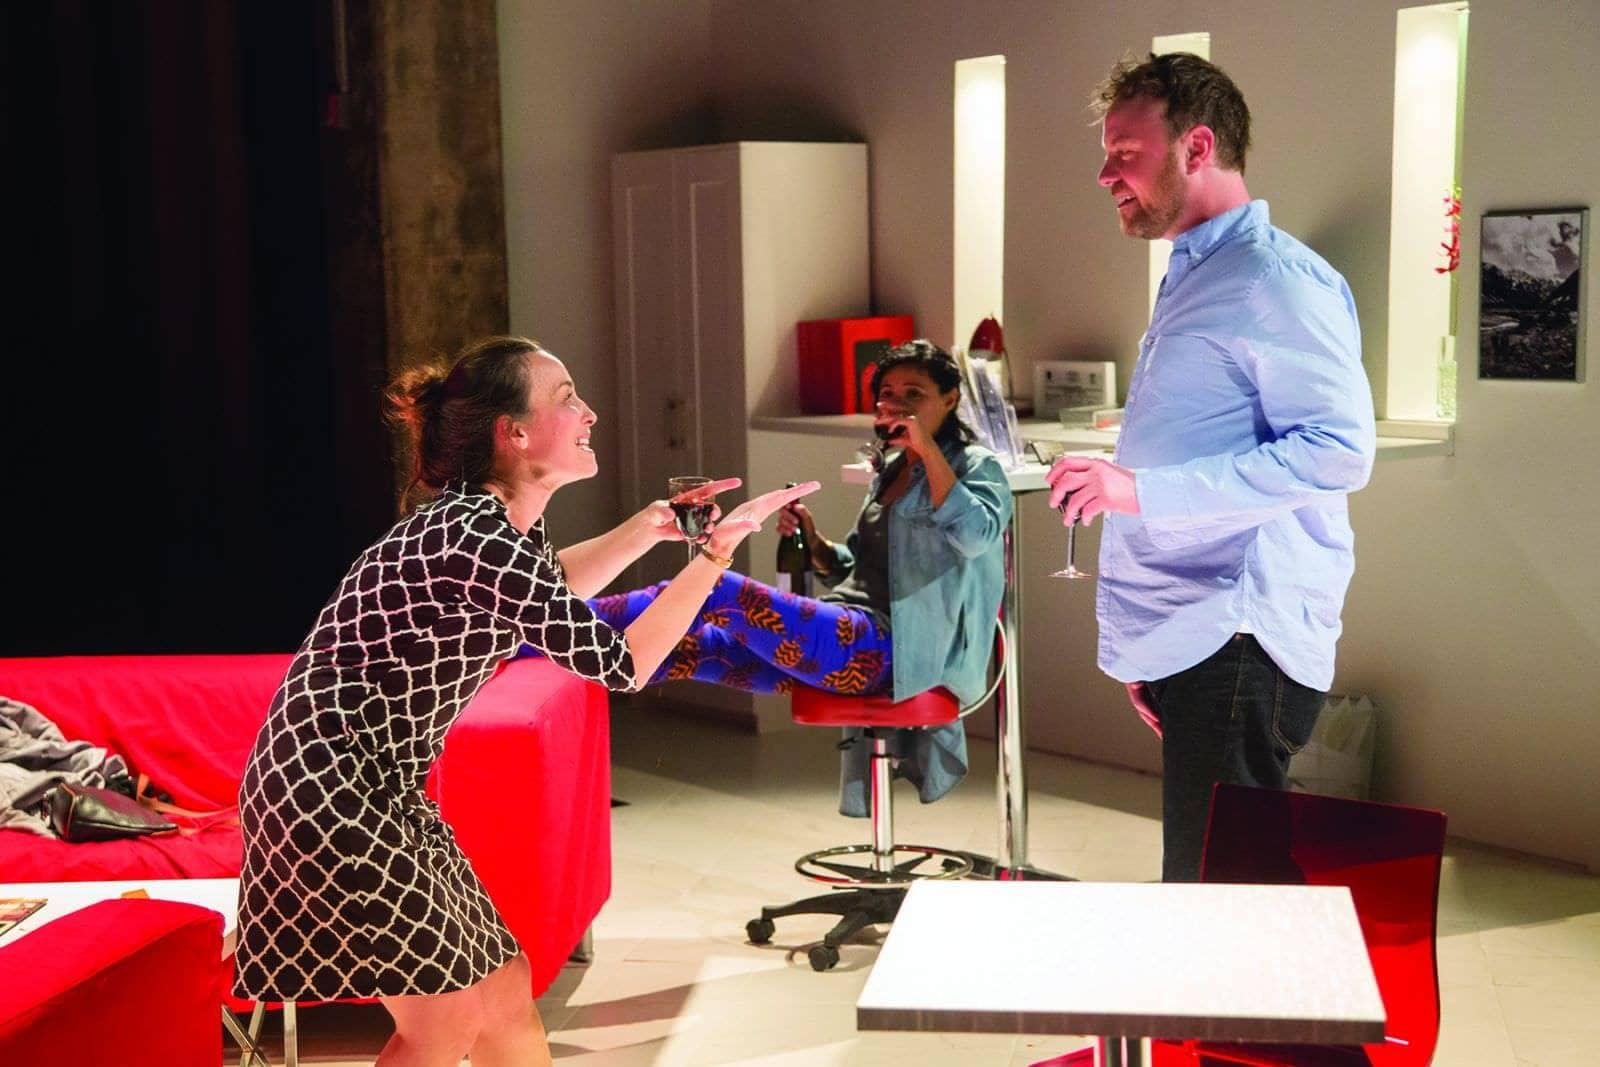 Birgit Huppuch (Dana), Jolly Abraham (Raina) and Tom Story (Lewis) in The Wolfe Twins. Photo by Igor Dmitry.